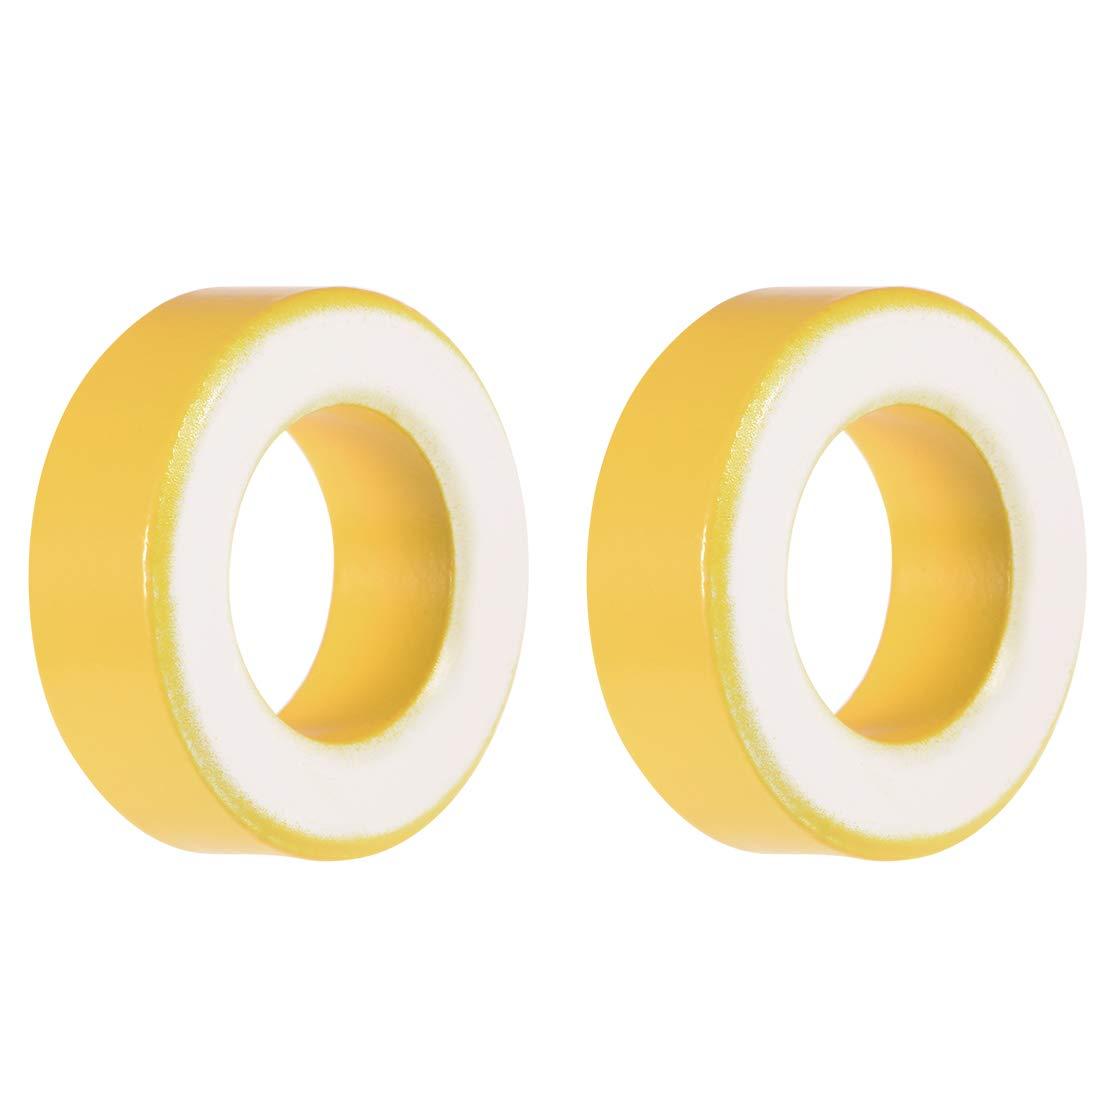 sourcing map Toroid Core Yellow White 10pcs 19.5 x 33.5 x 11.1mm Ferrite Chokes Ring Iron Powder Inductor Ferrite Rings